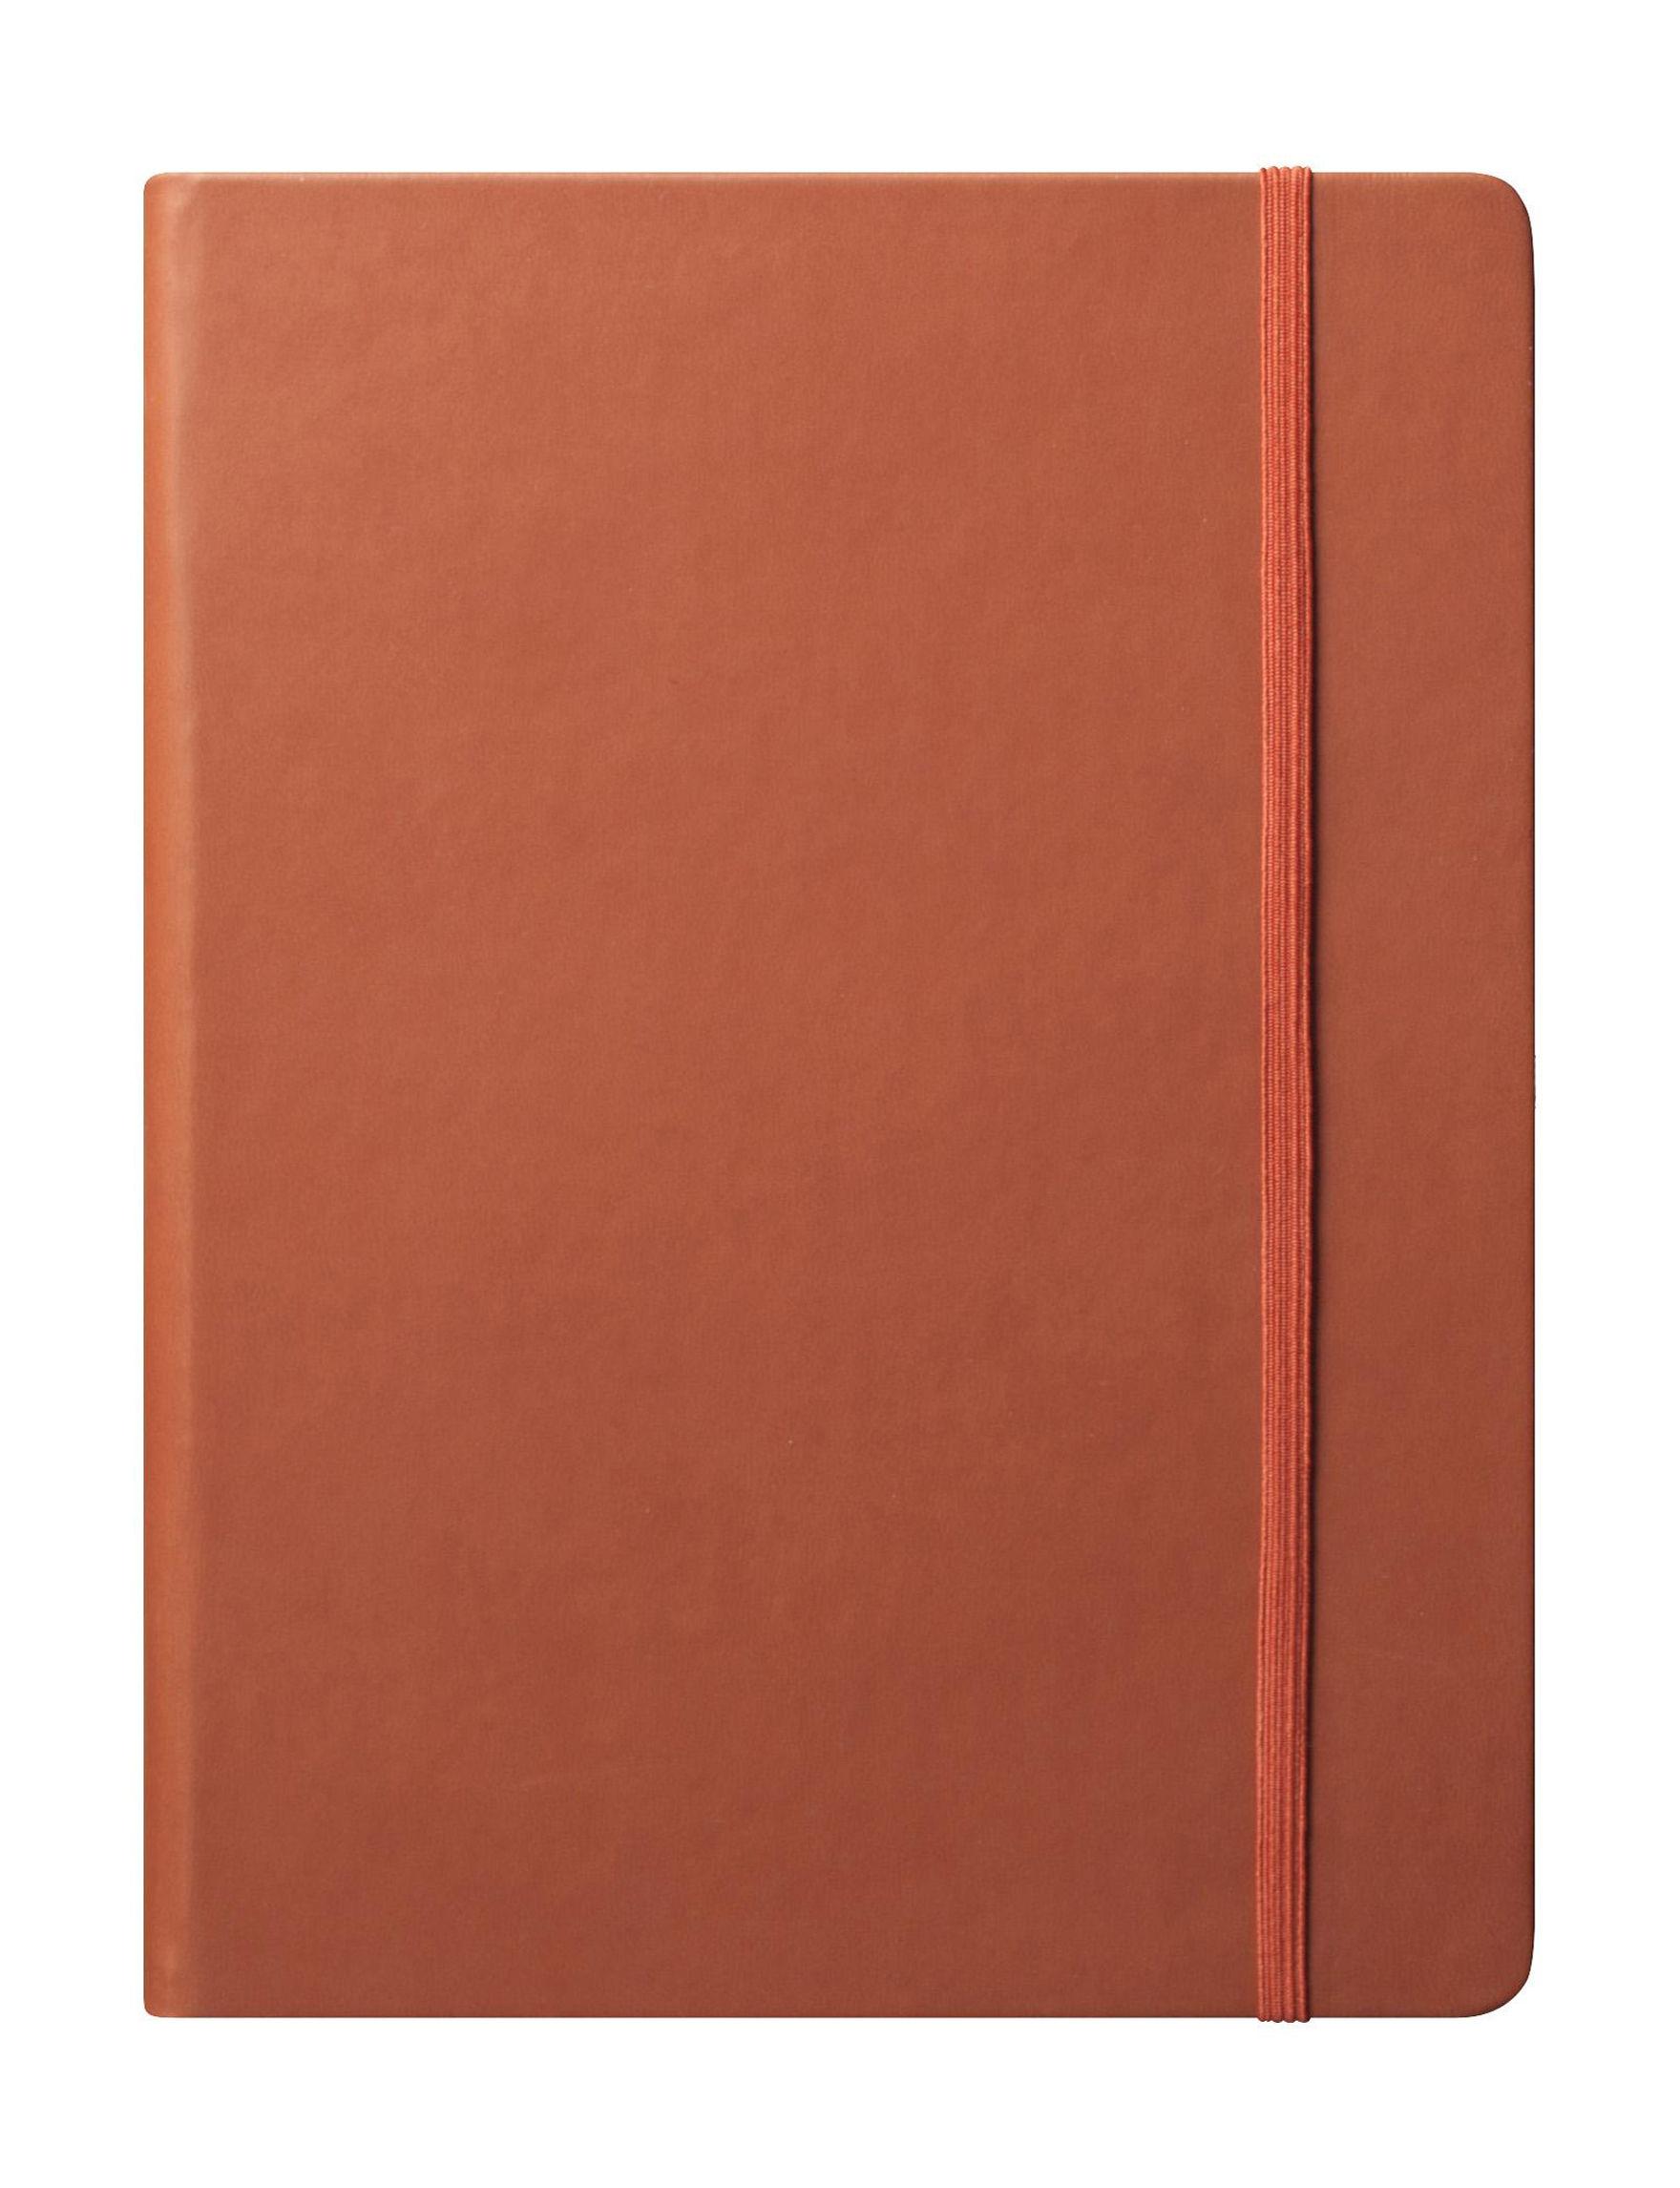 Eccolo Tan Journals & Notepads School & Office Supplies